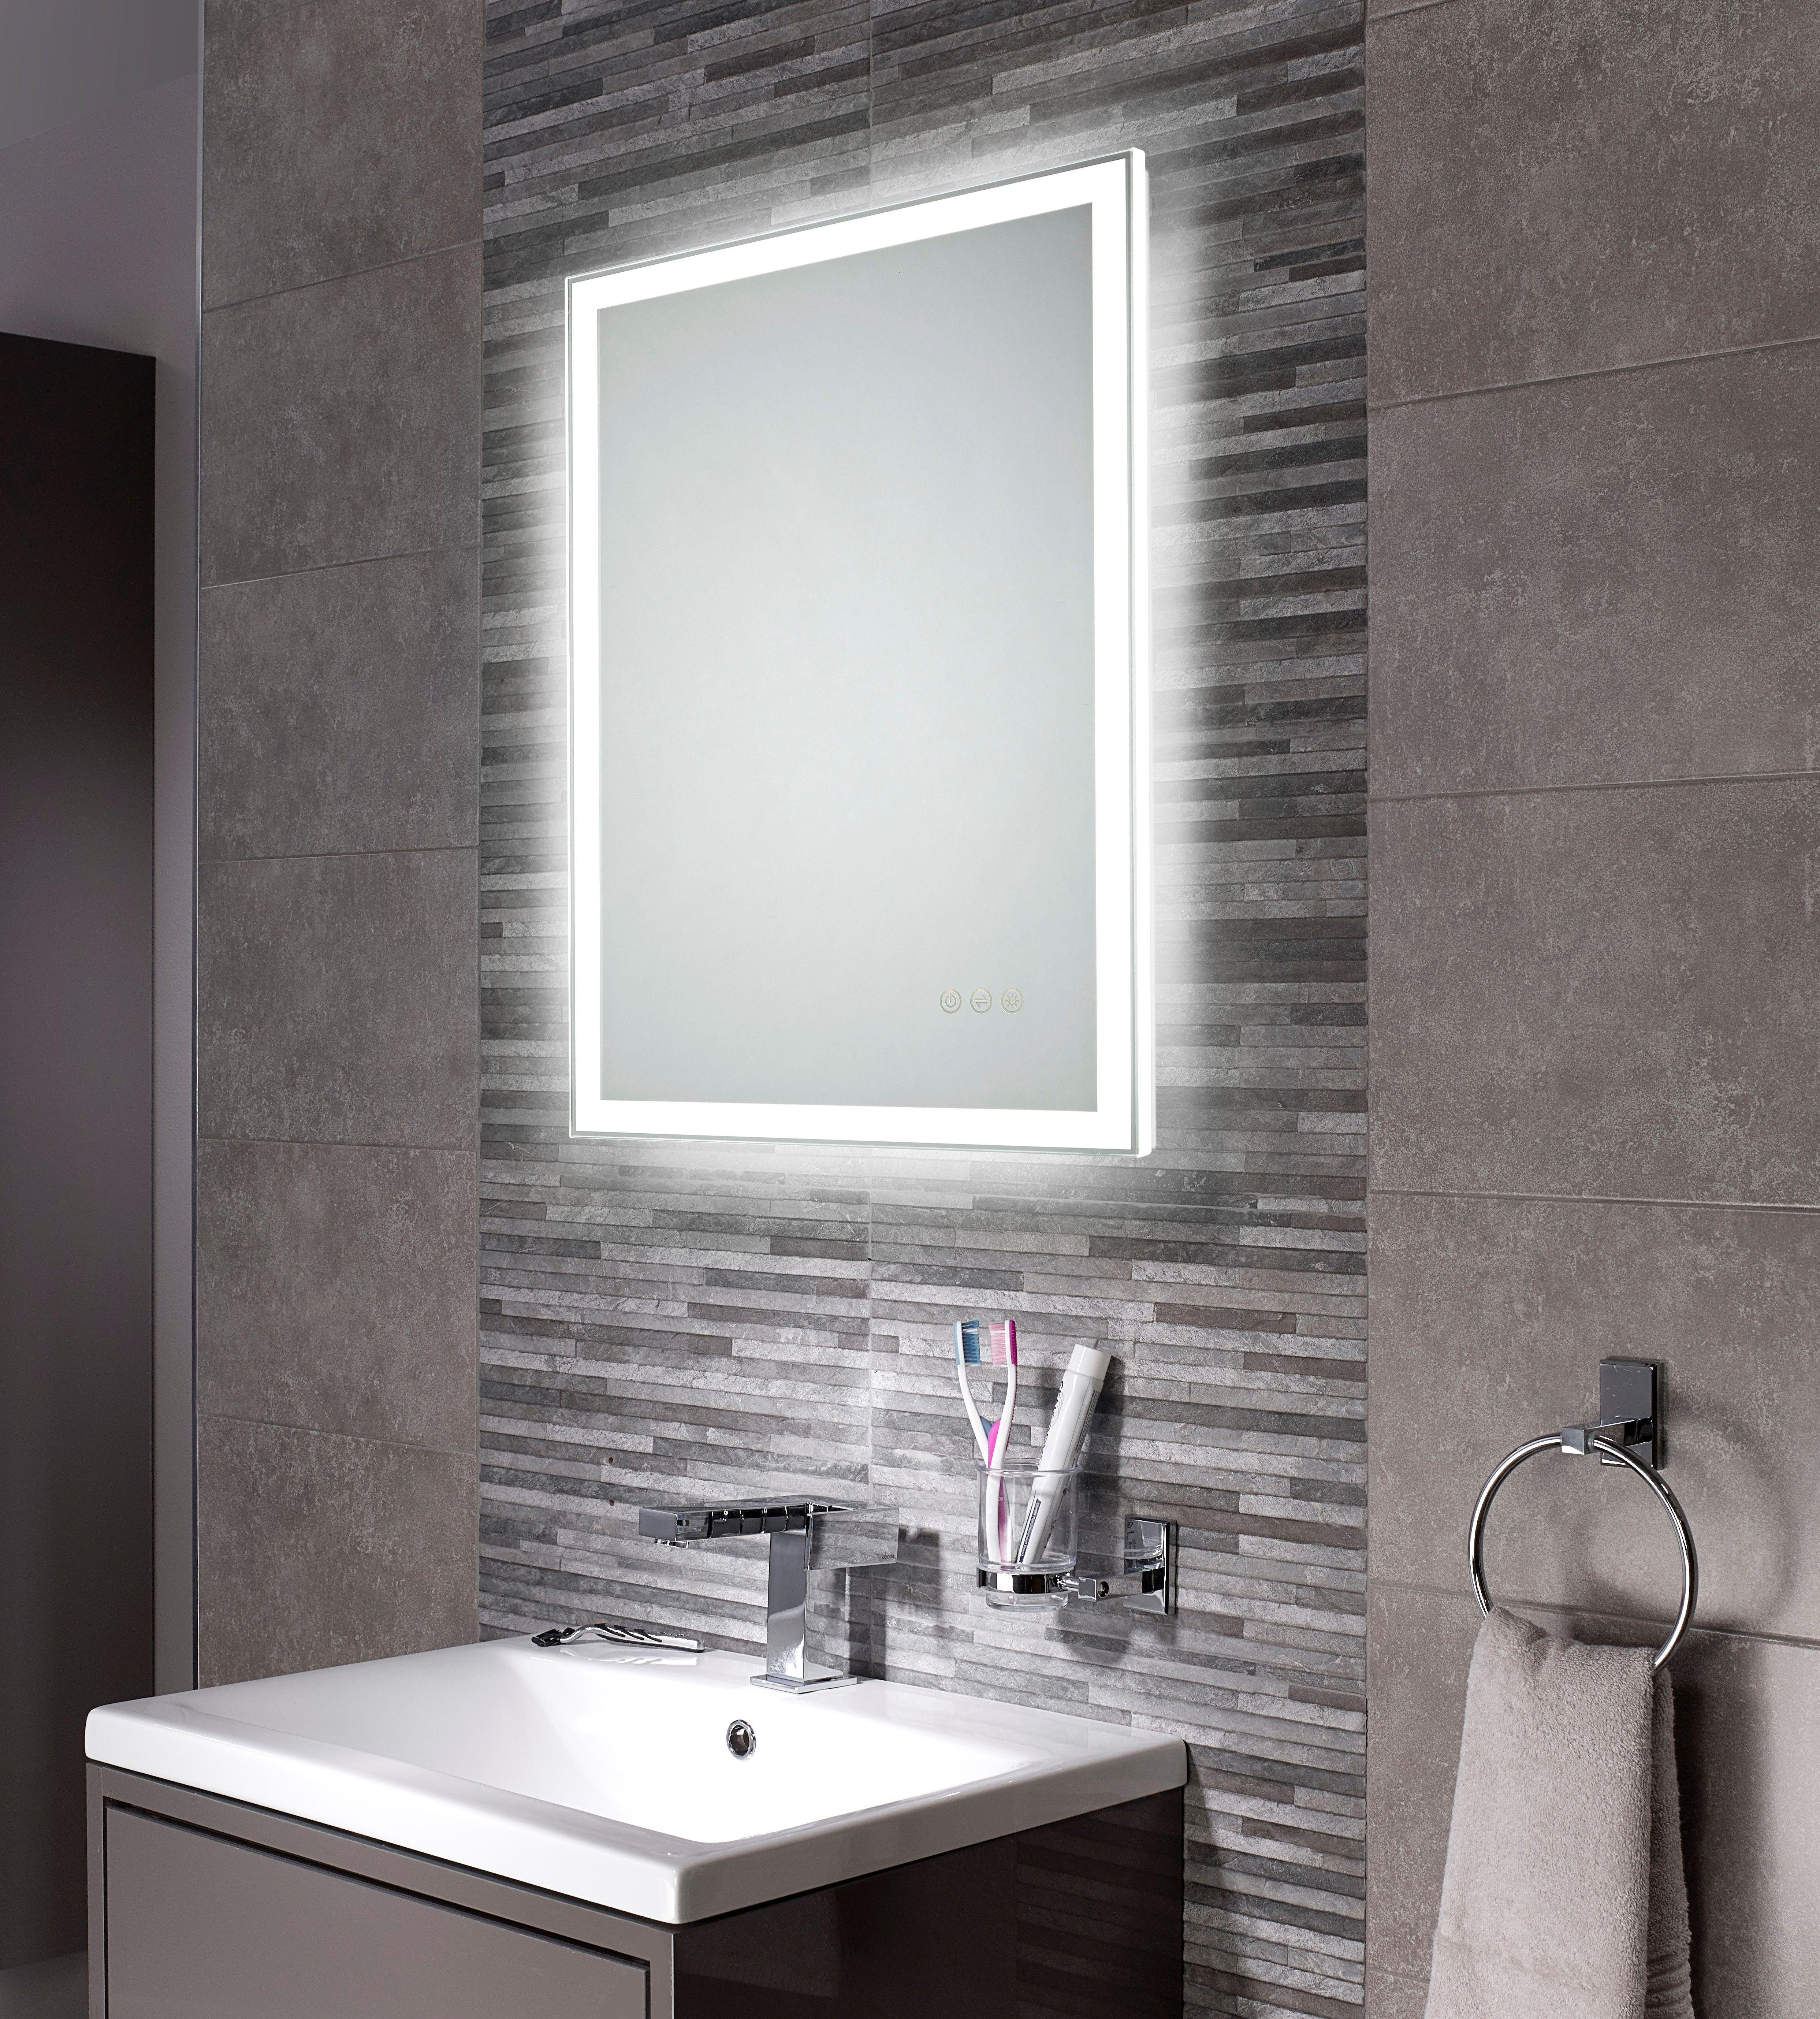 500x700mm Adella Led Illuminated Bathroom Mirror Grey Bathroom Mirrors Led Mirror Bathroom Modern Bathroom Design